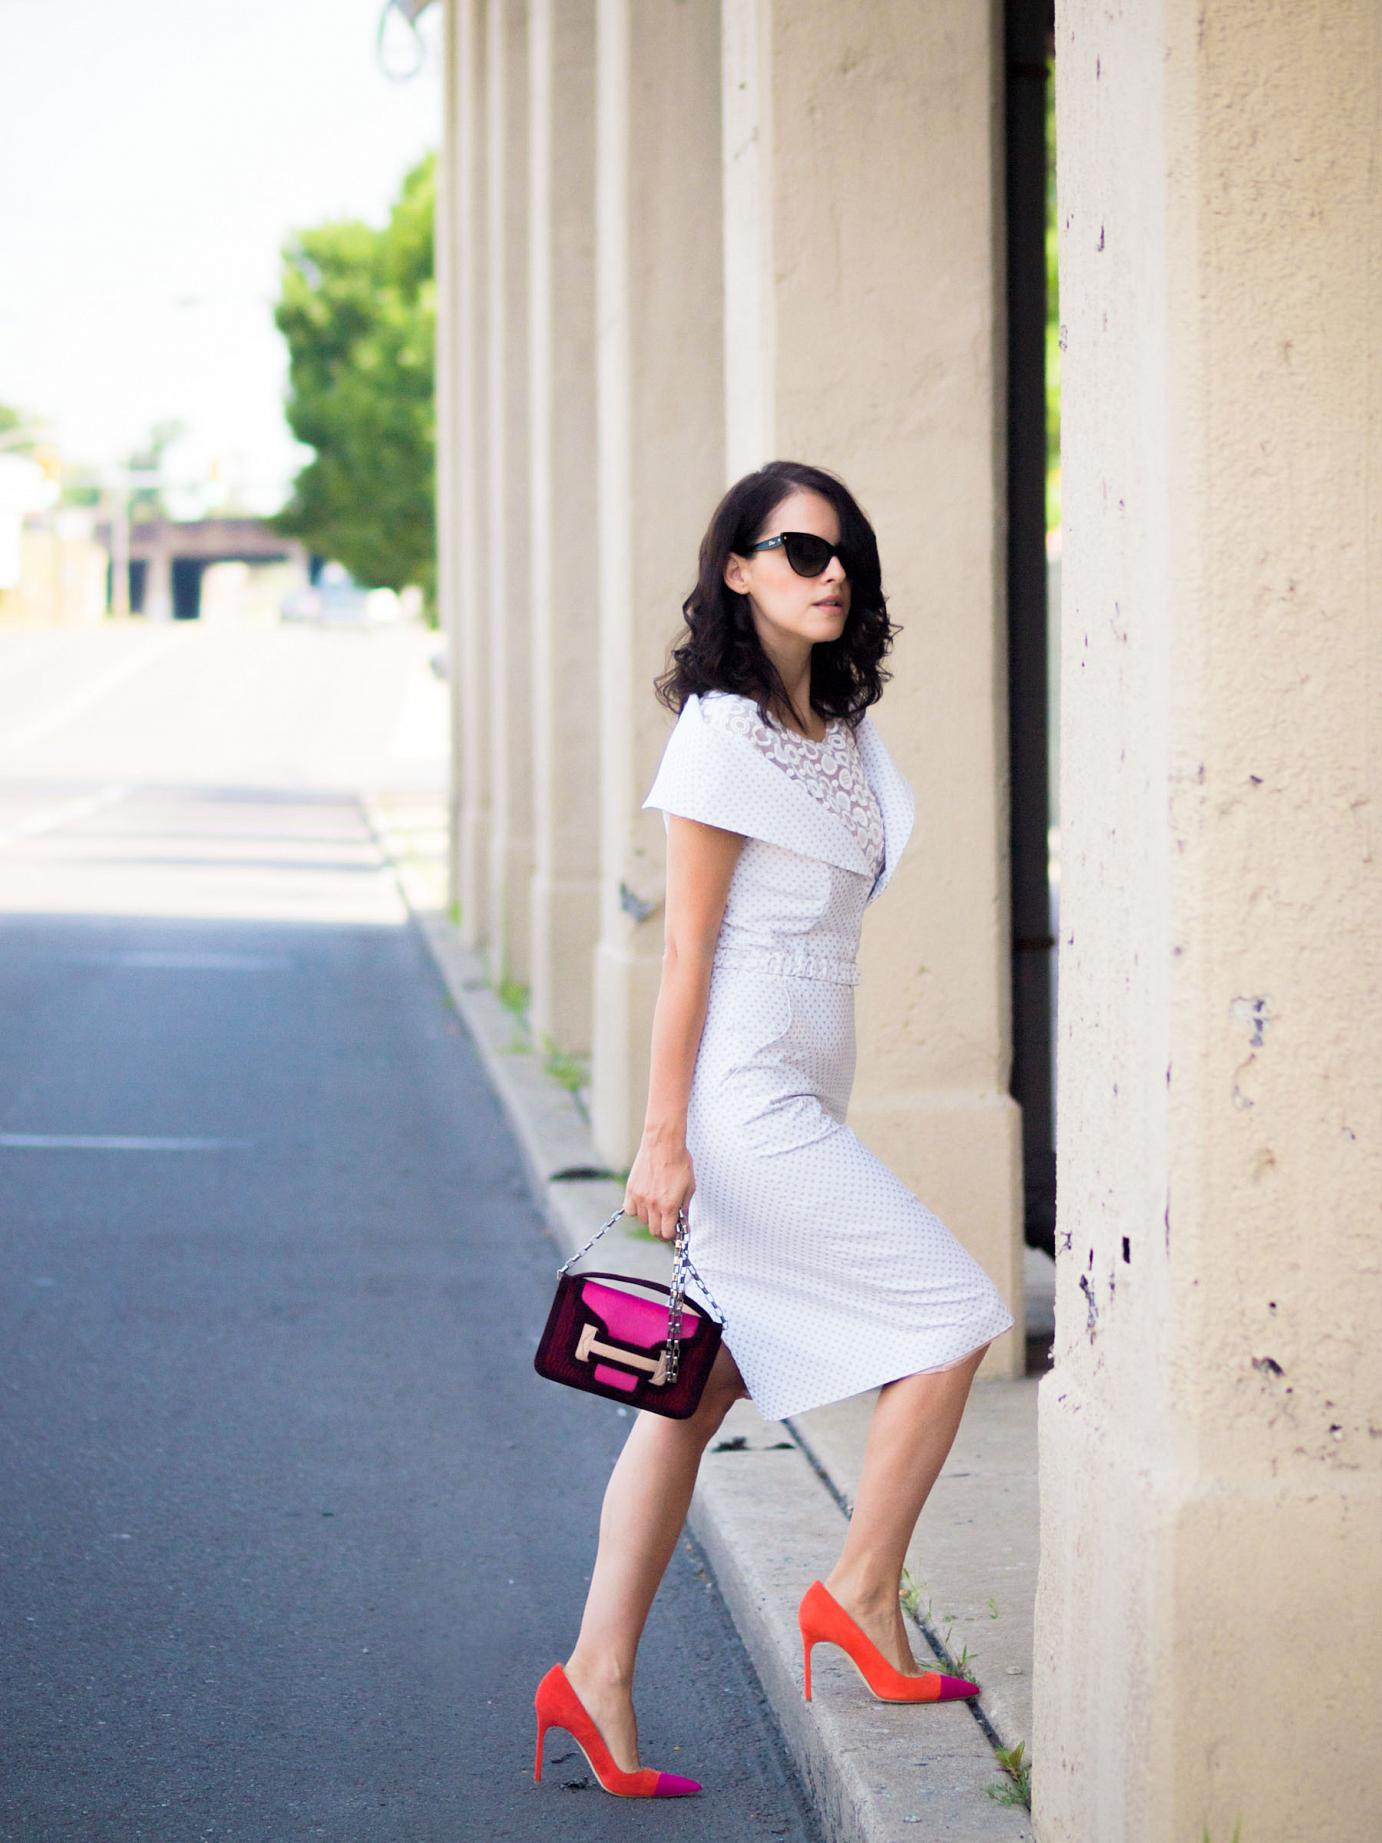 bittersweet colours, tia cibani, pierre hardy bag, manolo blahnik shoes, dior sunglasses, polka dots trend, polka dot dress, summer style, summer dress, colours, street style